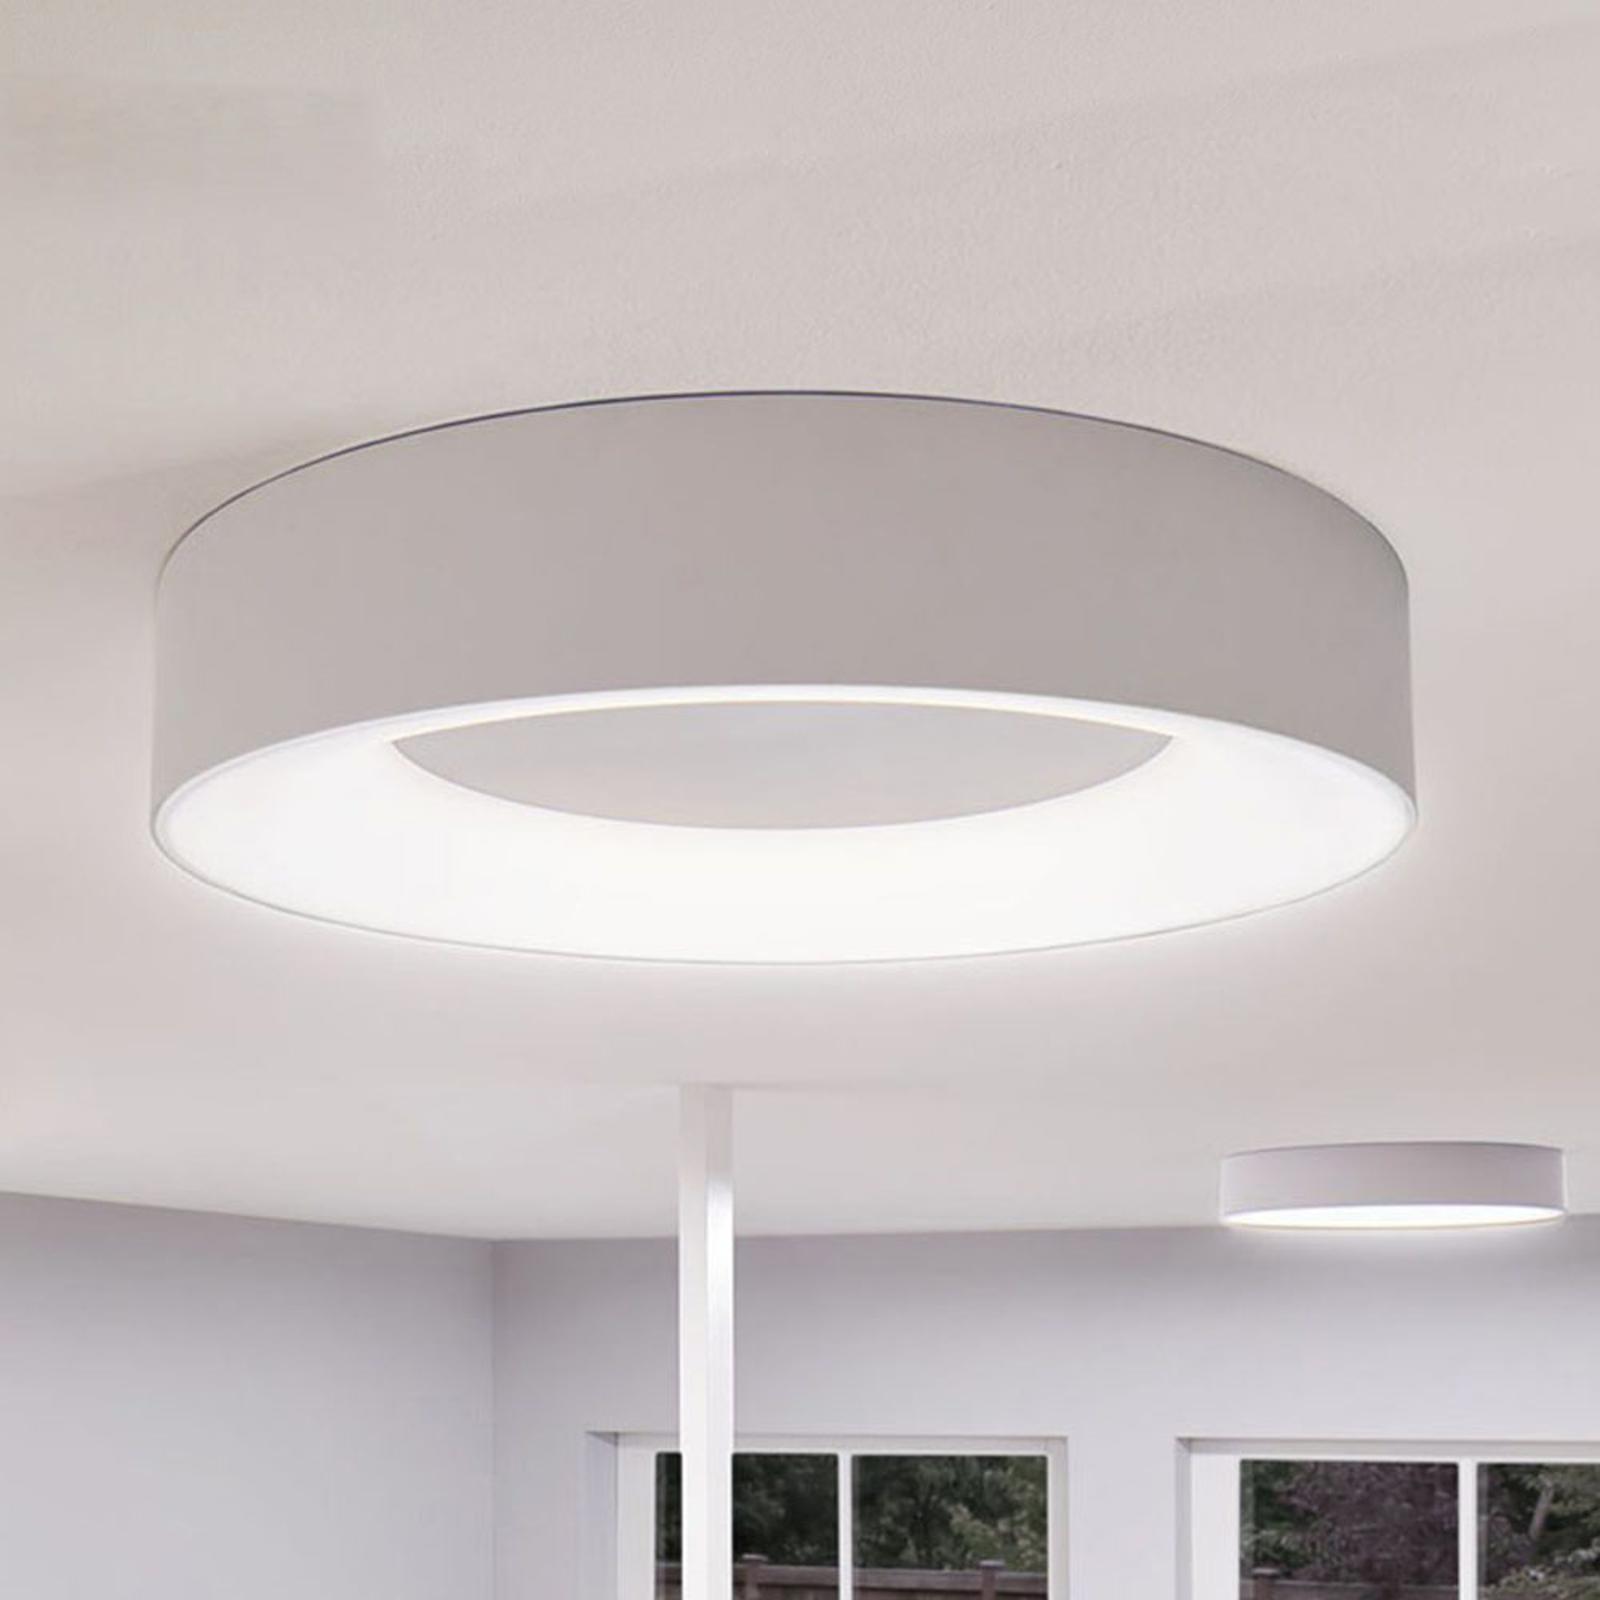 Paulmann HomeSpa Casca LED-Deckenleuchte, Ø 40 cm